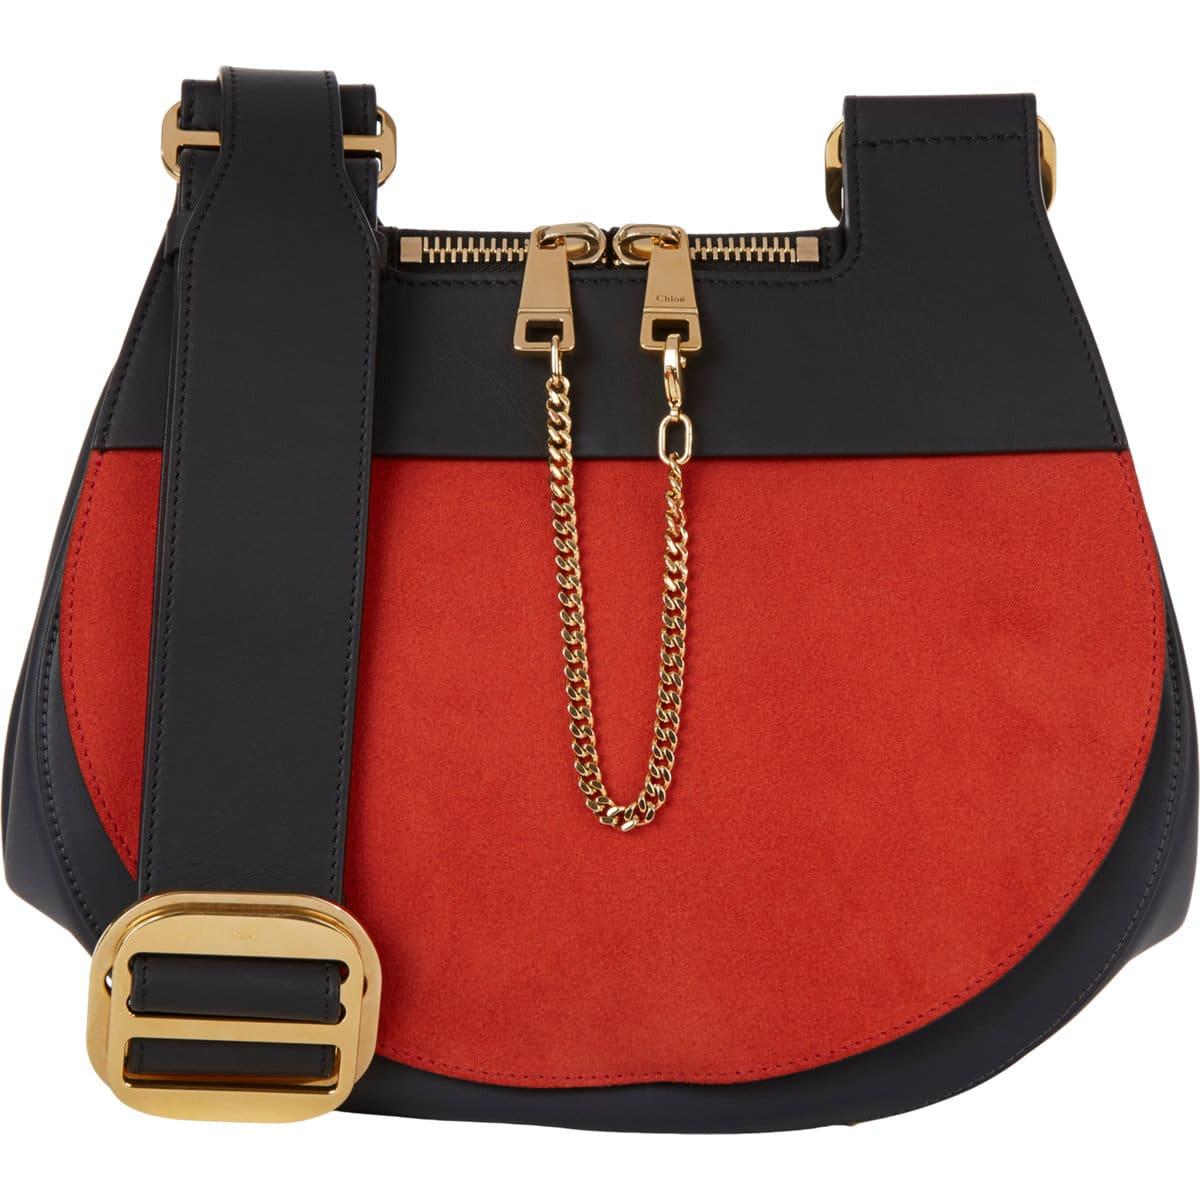 69be120aae medium saddle bag in black smooth calfskin - celine